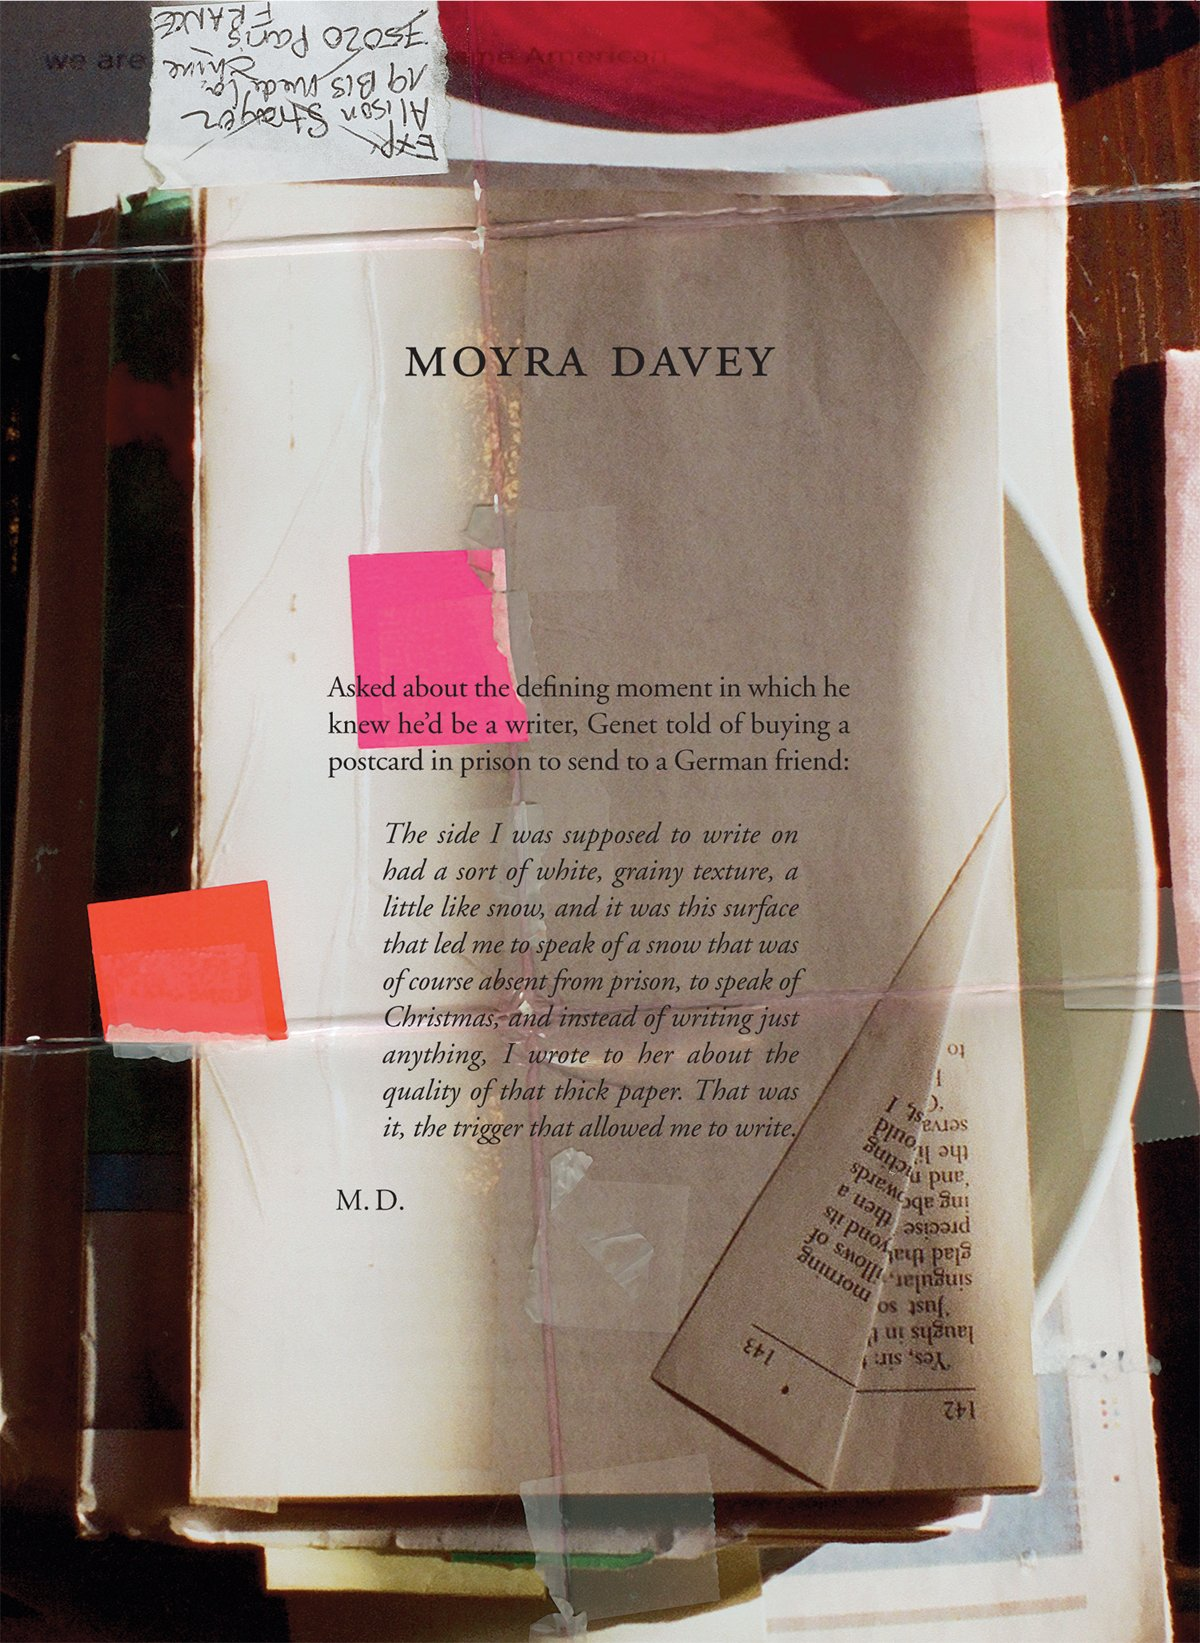 Moyra Davey: Burn the Diaries